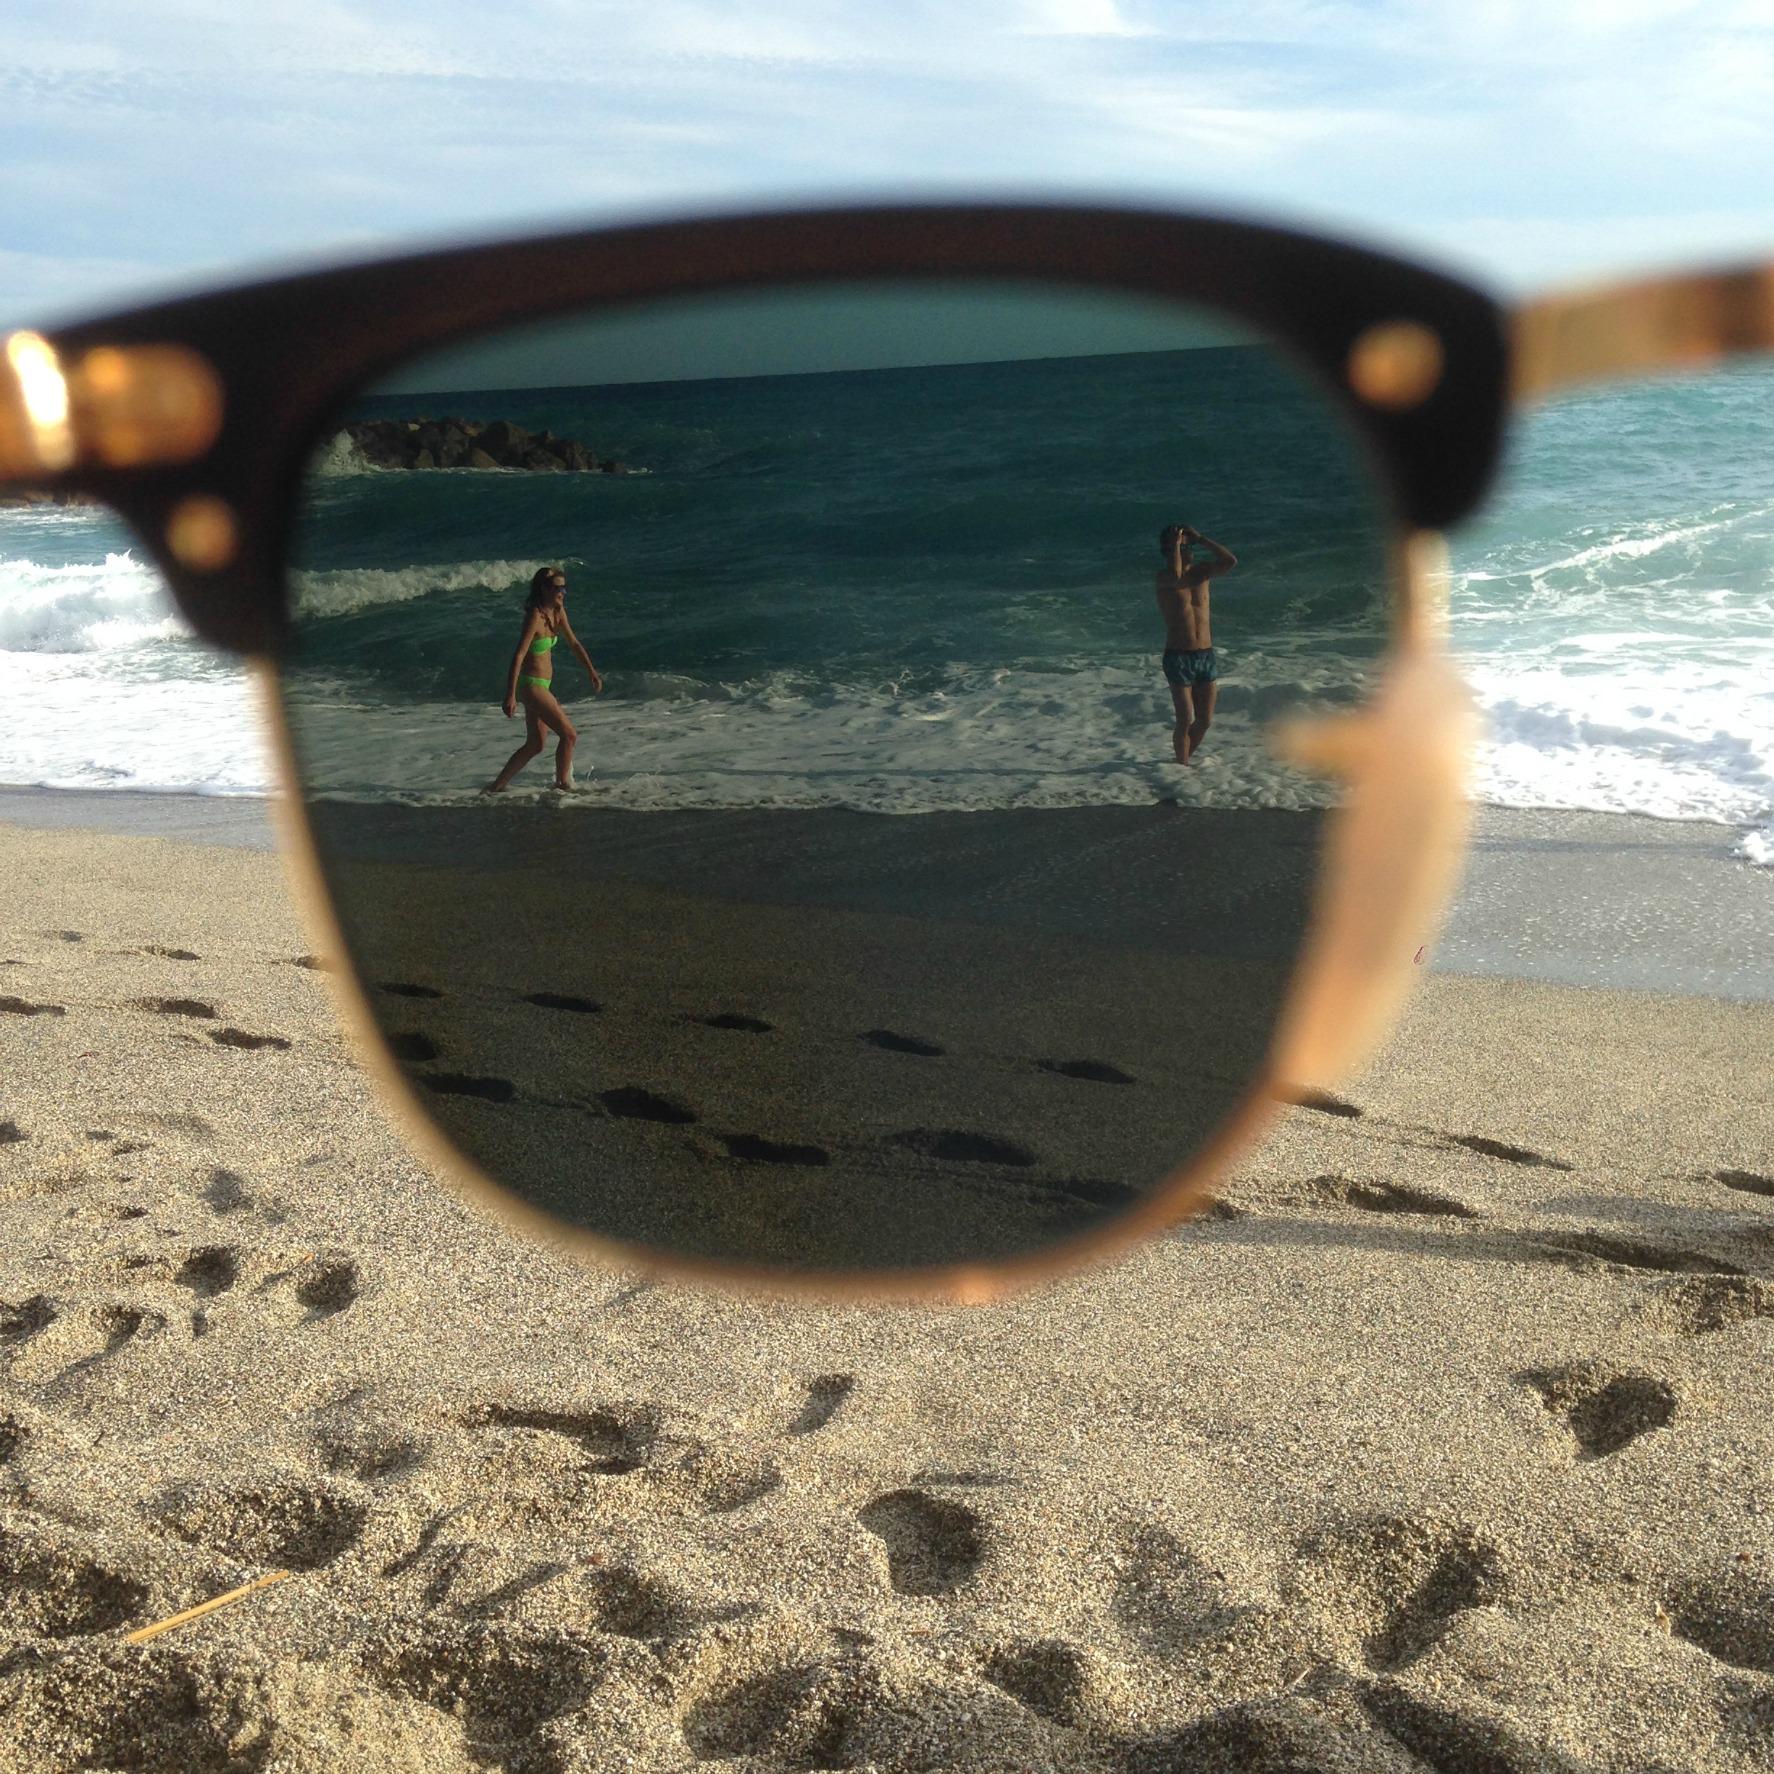 d6b4a1c03f7 5 Tips - Buying Beach Sunglasses